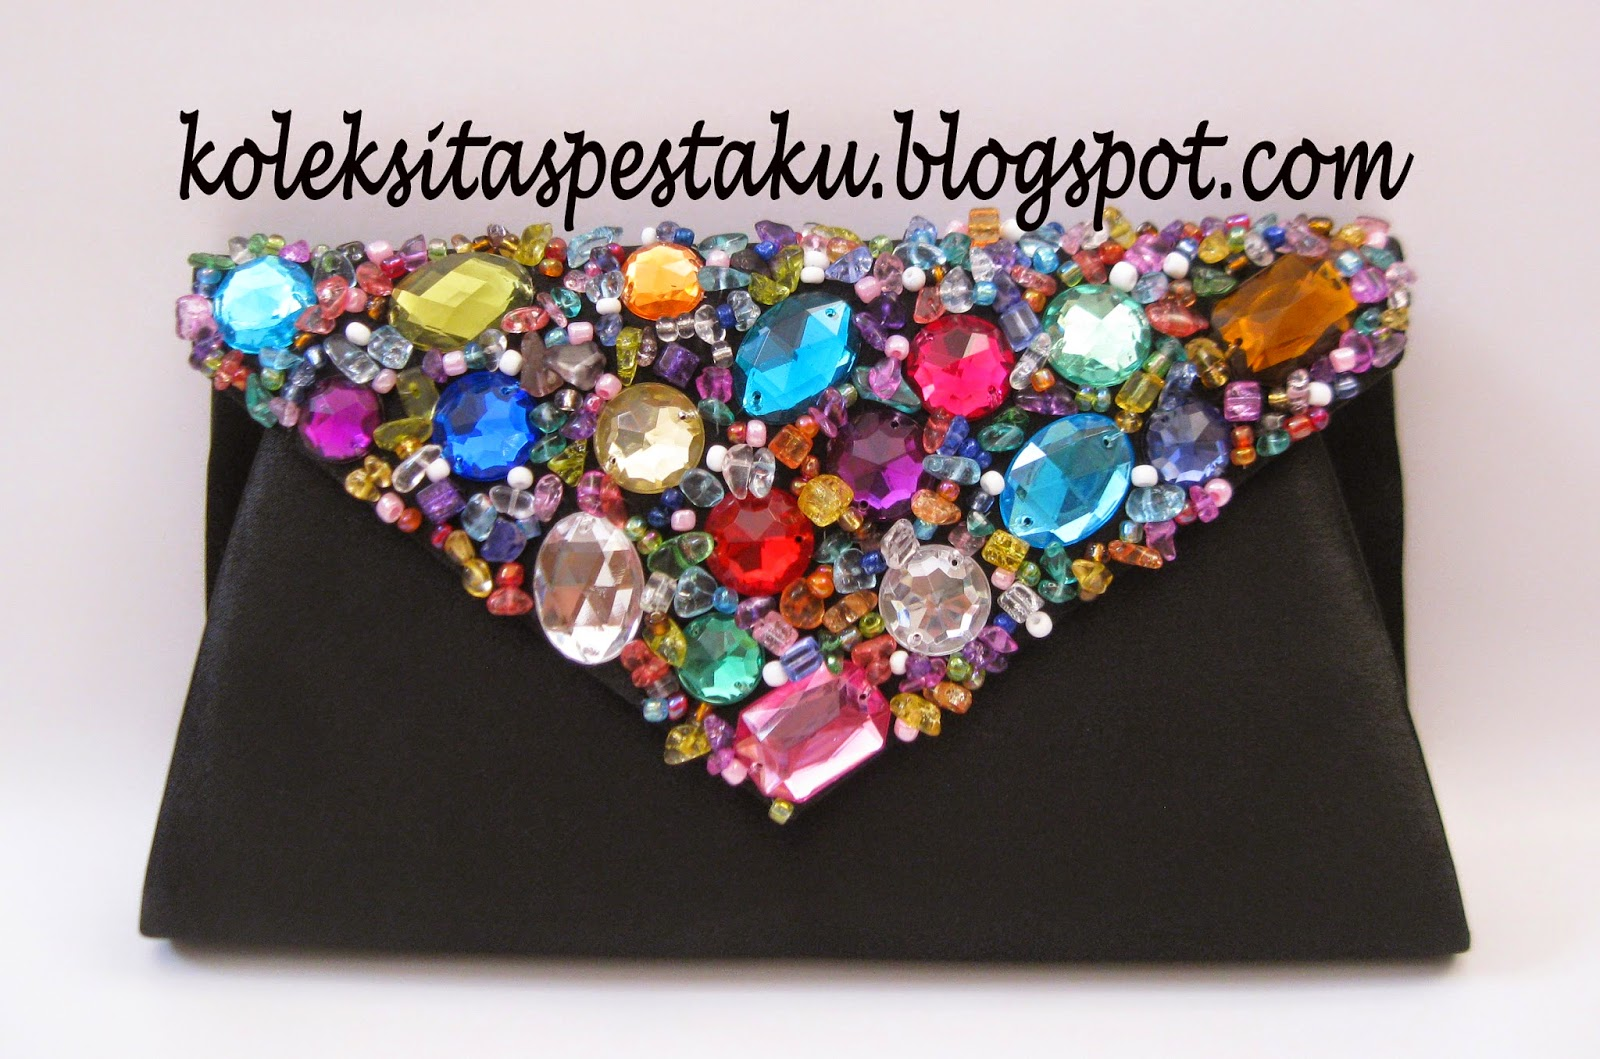 Ready Stock Terbaru dan Mewah Clutch Bag Cantik Mewah. TAS PESTA ... 53887f5830